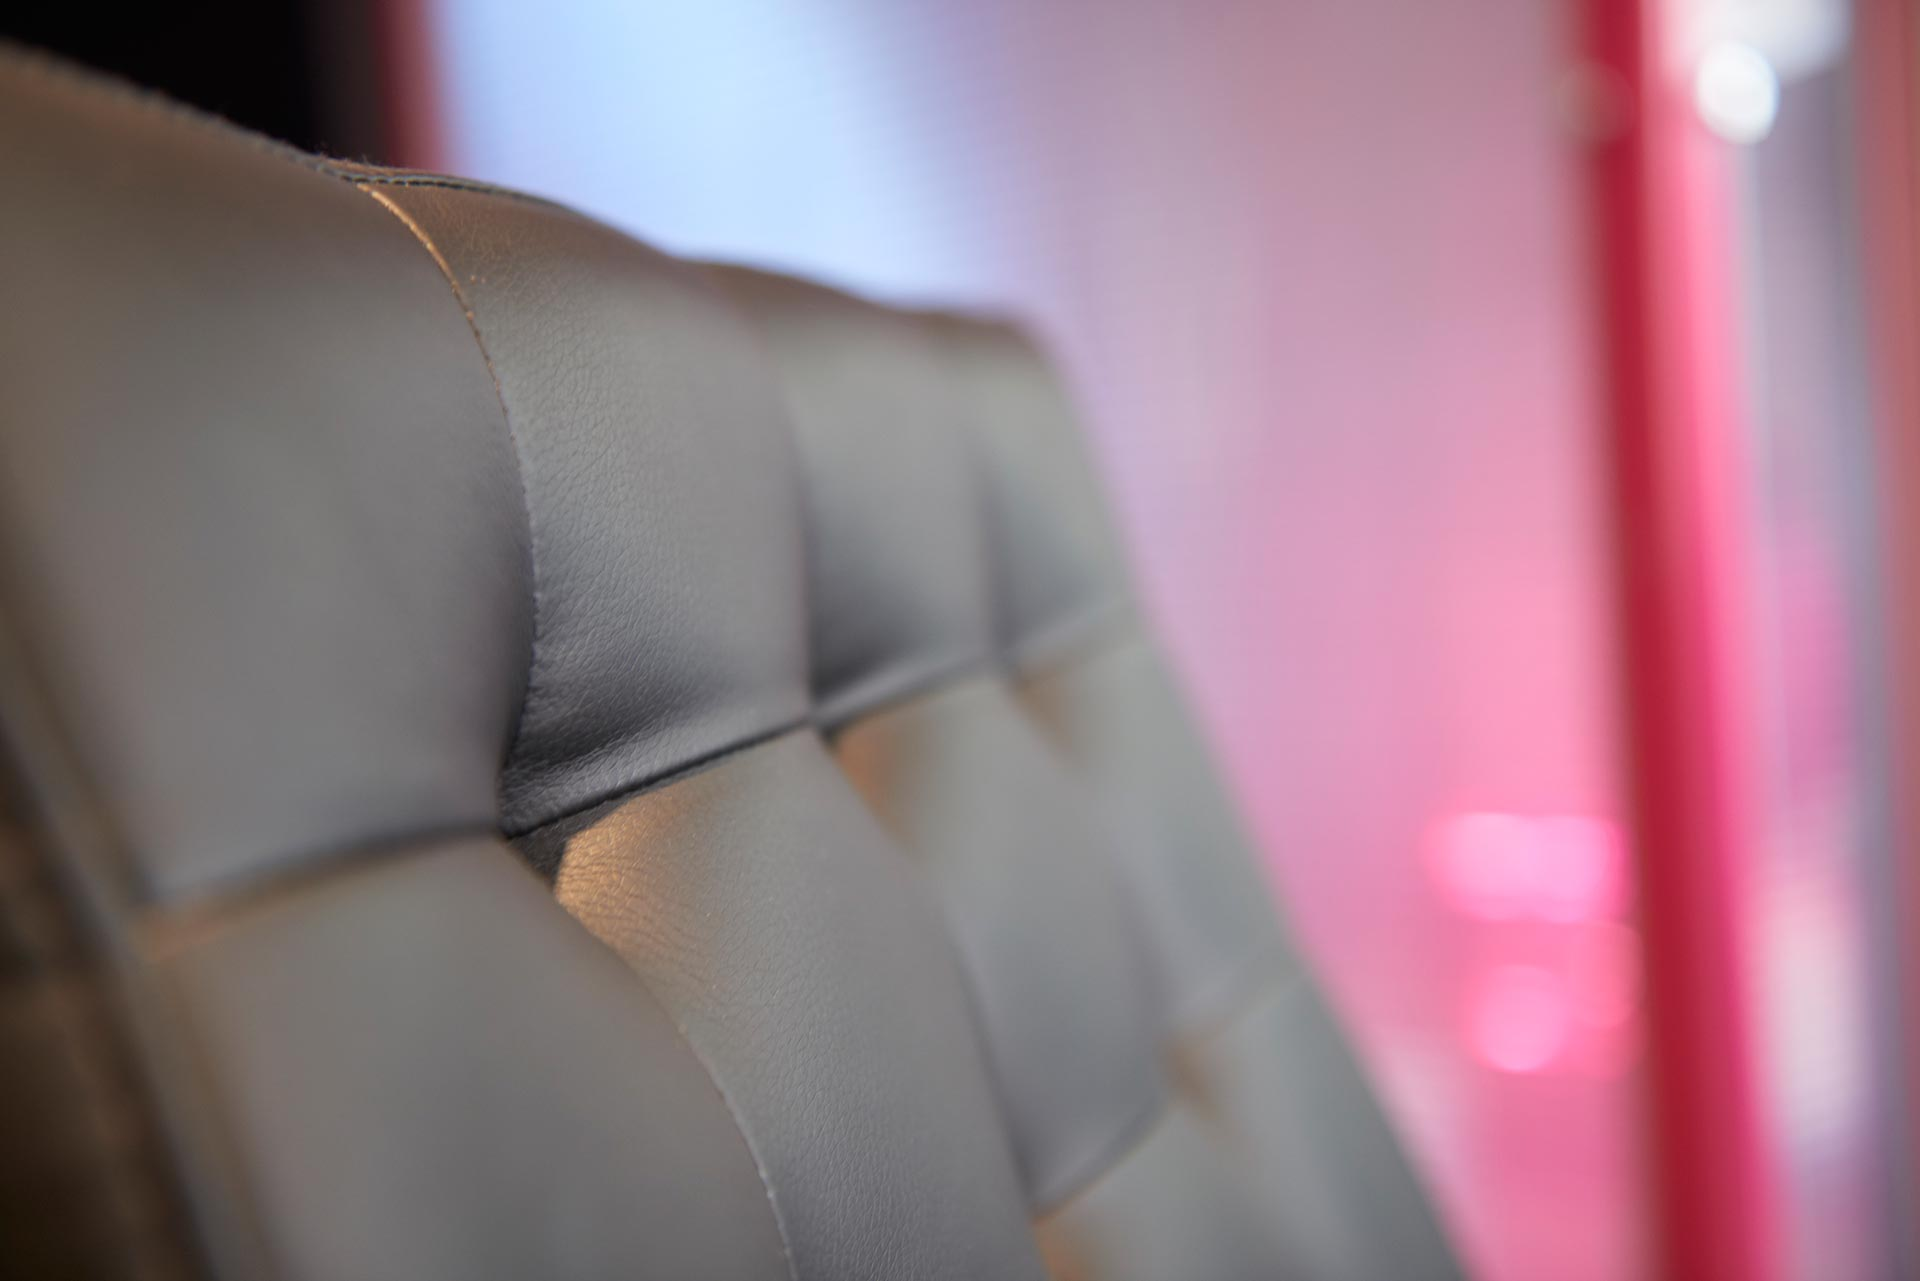 Board room chair detail